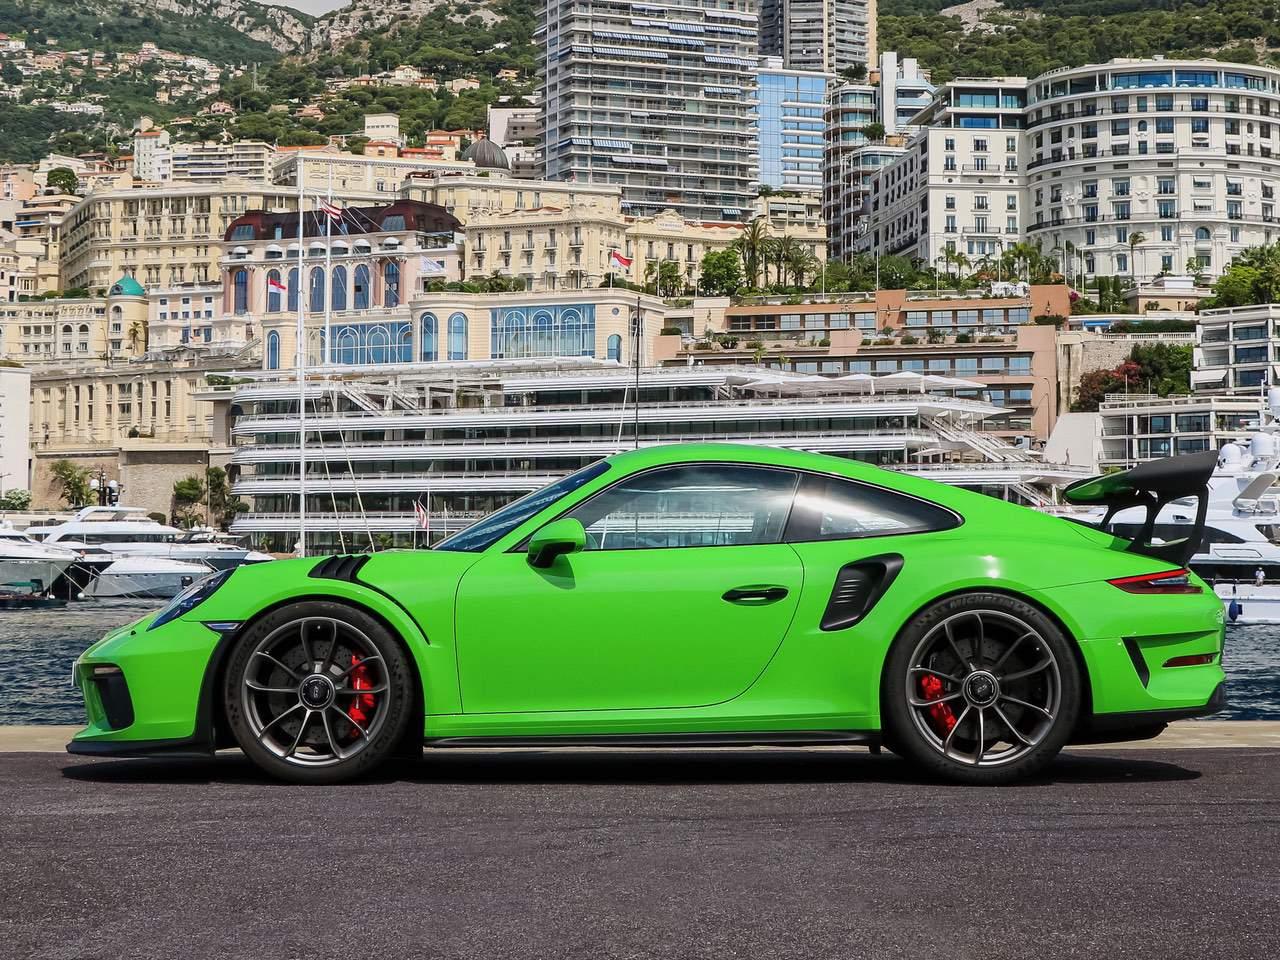 Porsche-911-Coupè-991-GT3-RS-PDK-7